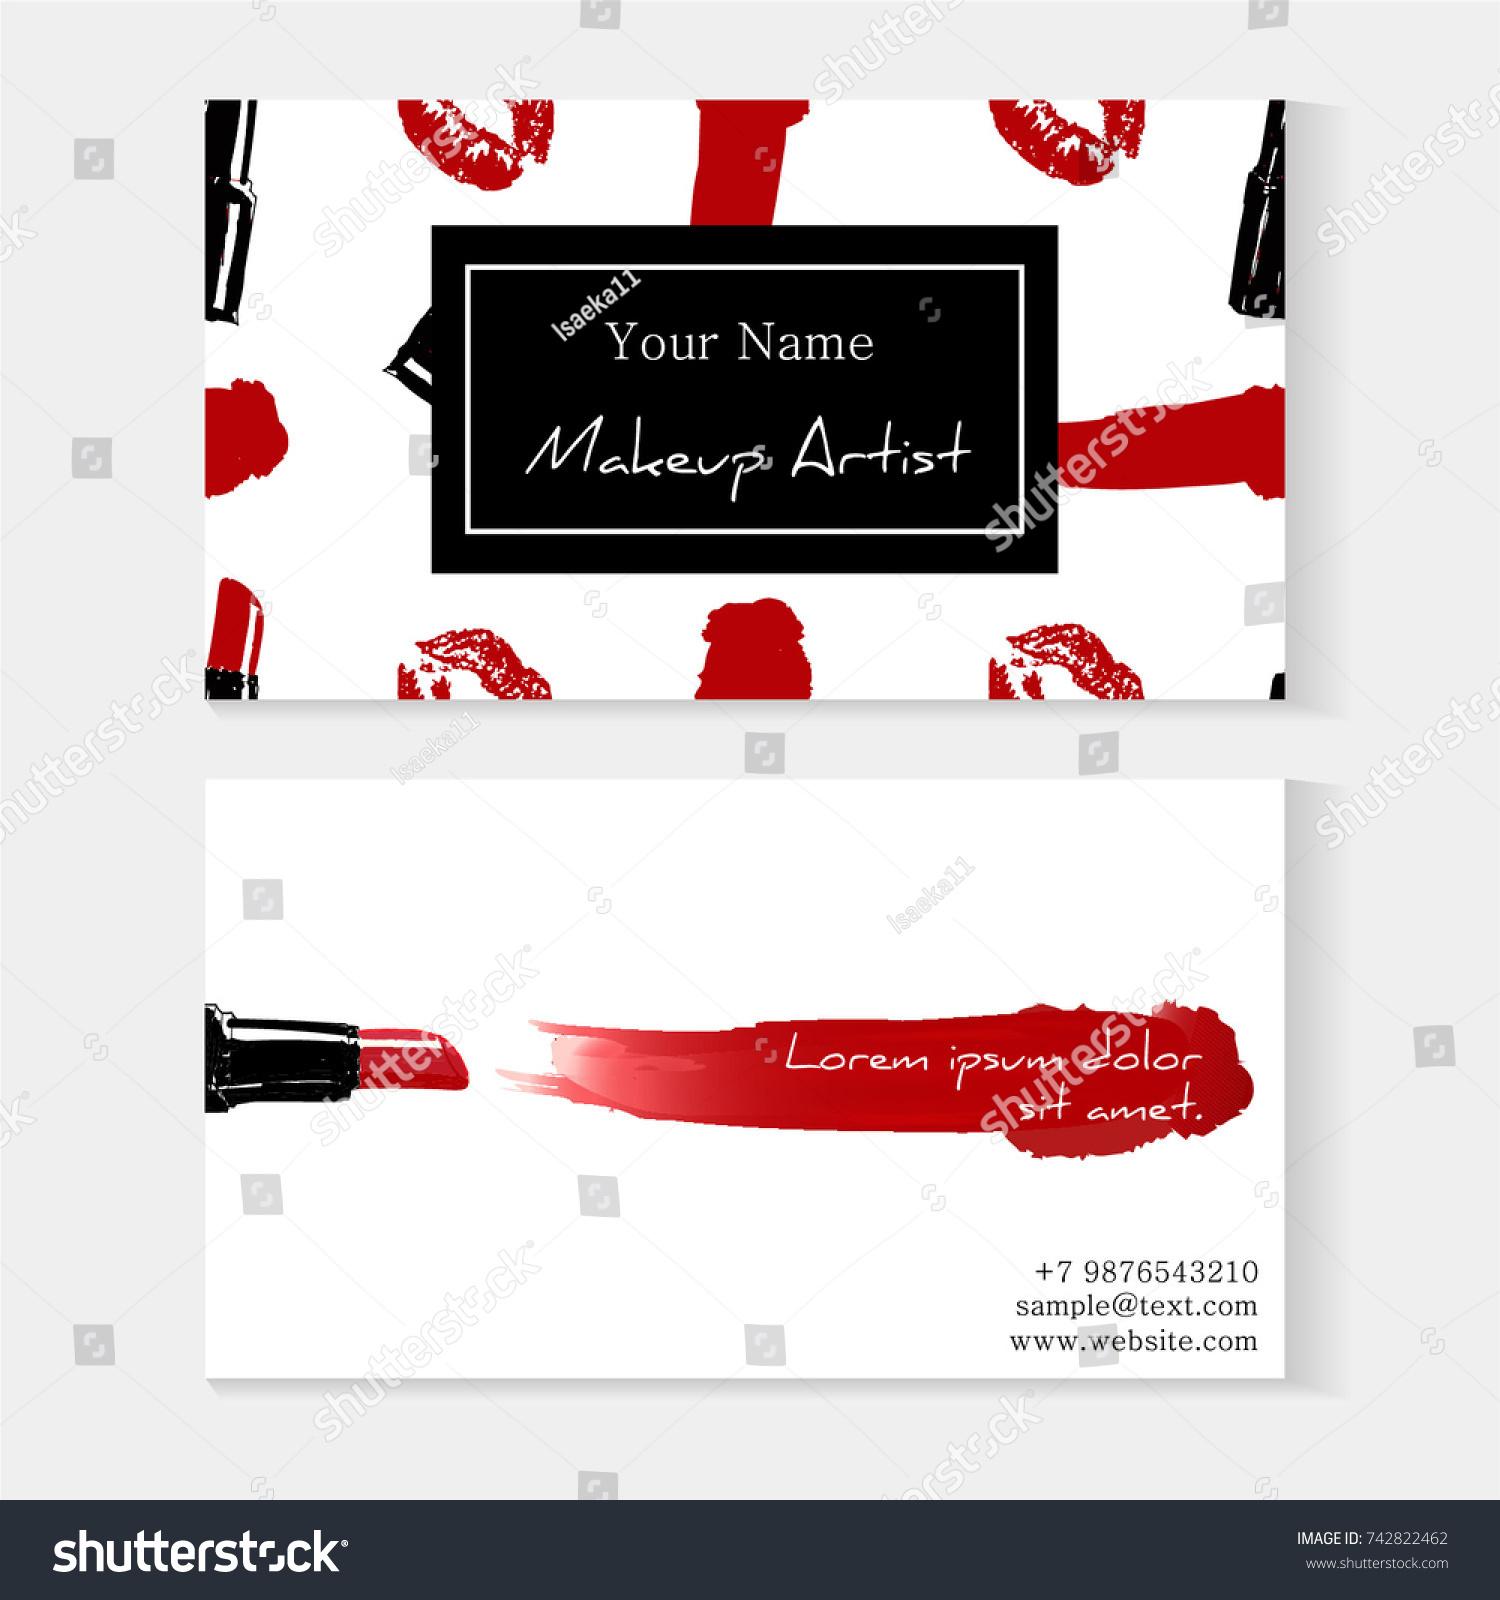 Makeup Artist Business Card Template Red Stock Vector 742822462 ...